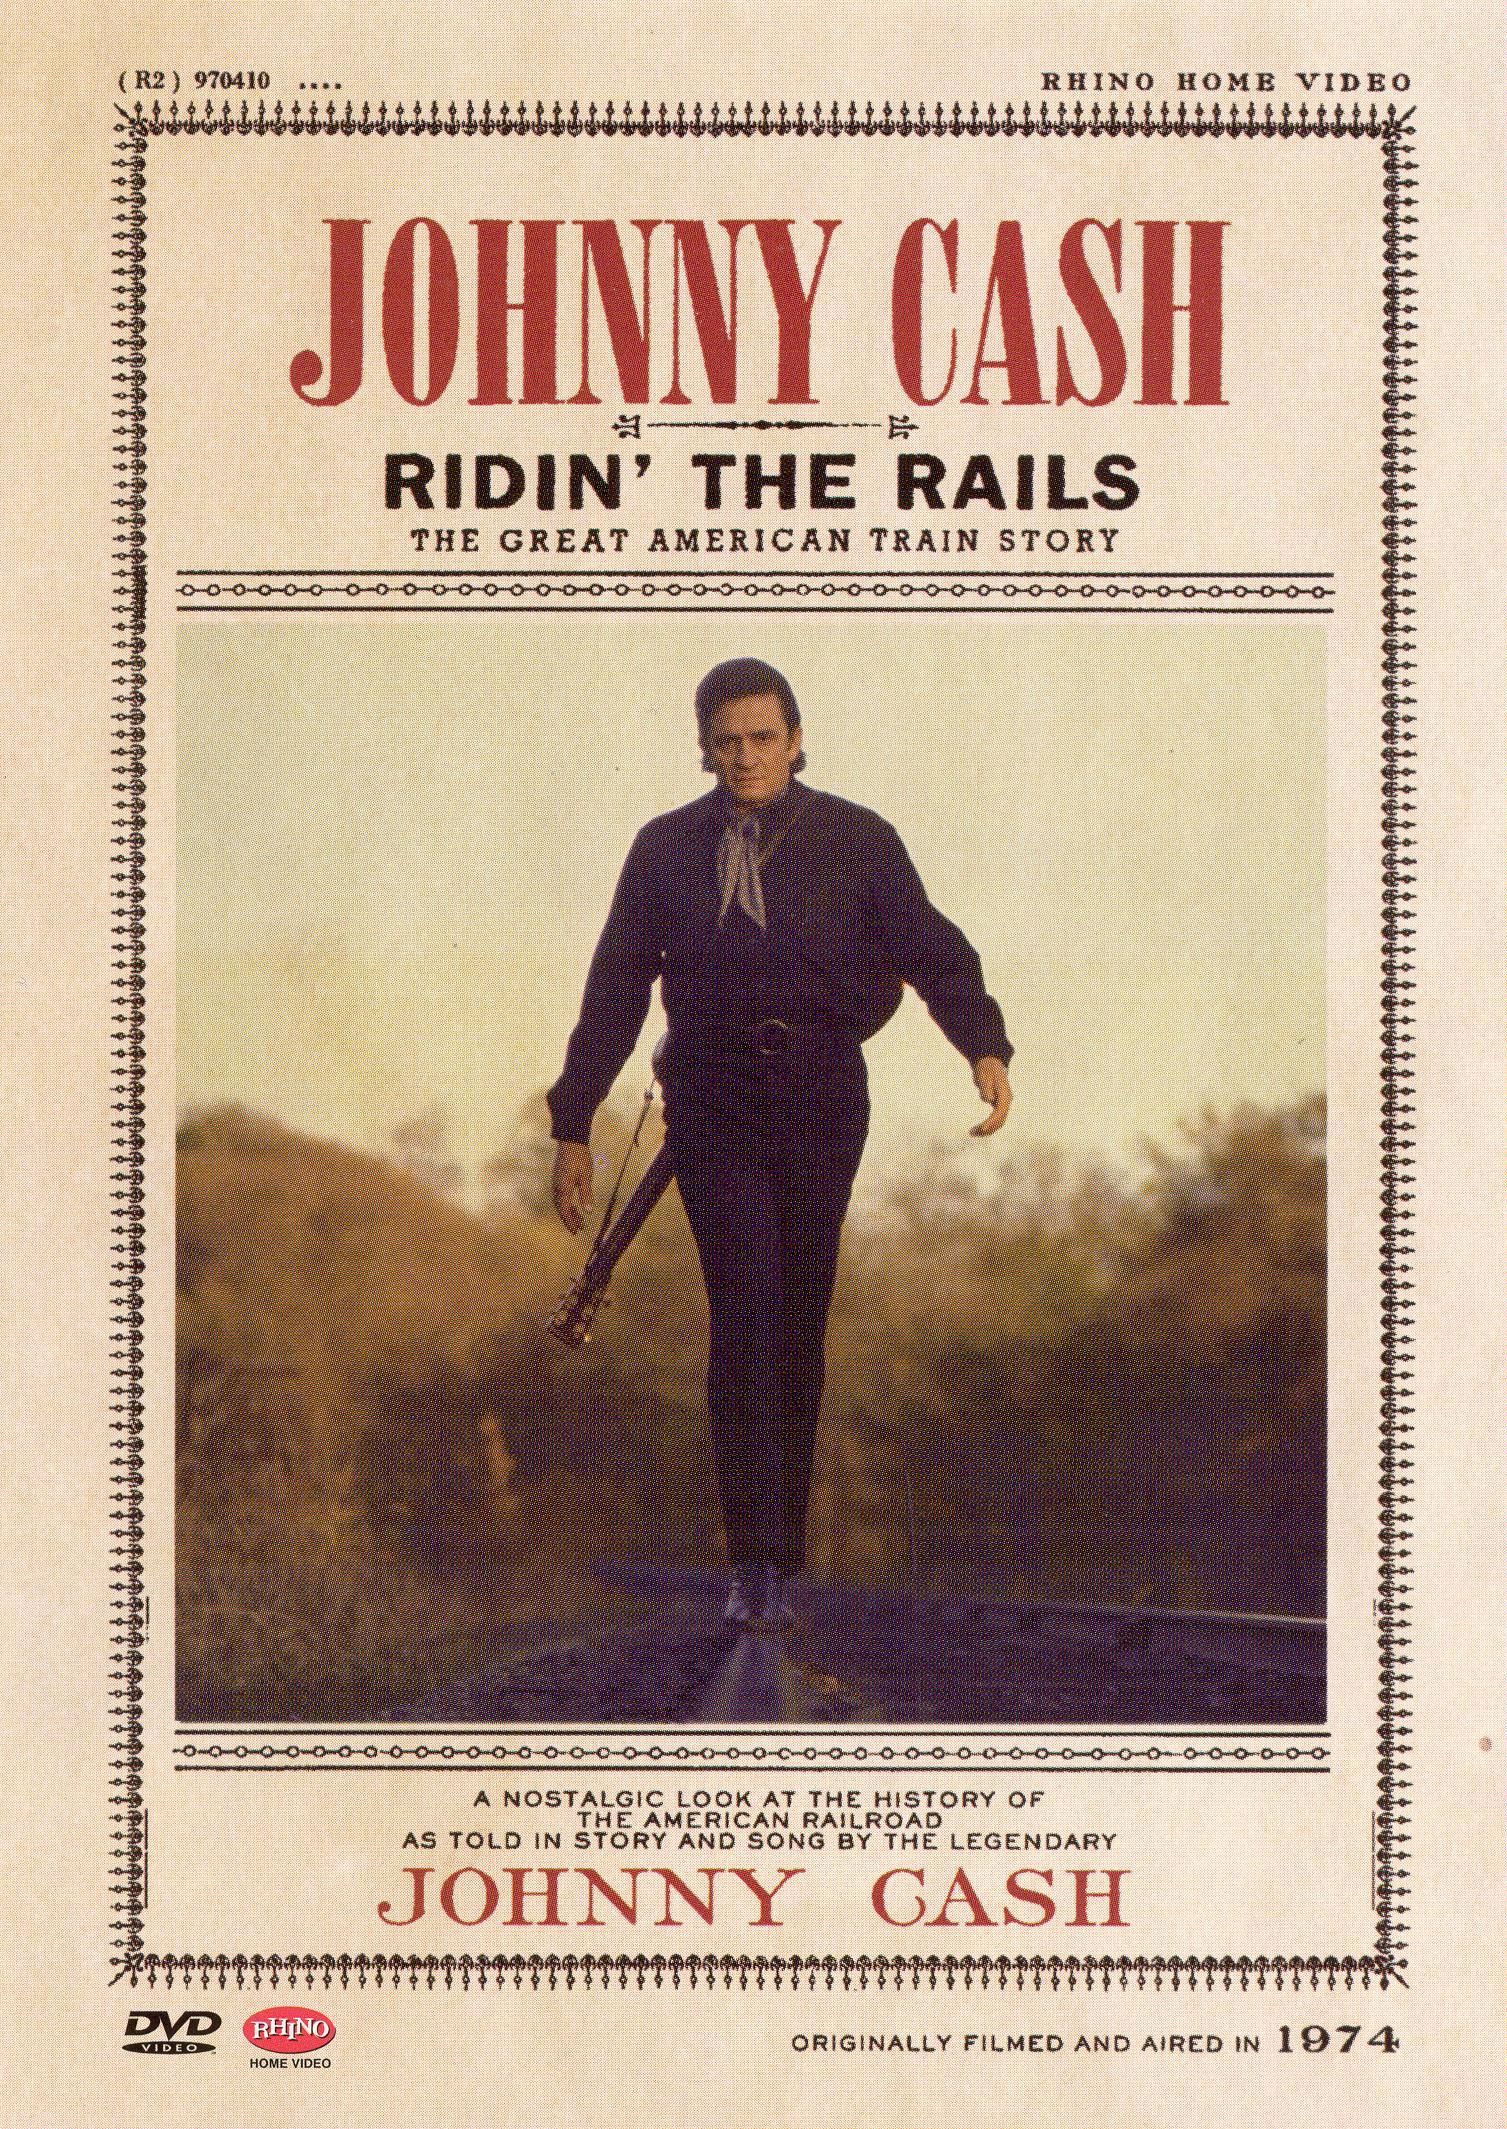 Johnny Cash: Ridin' the Rails